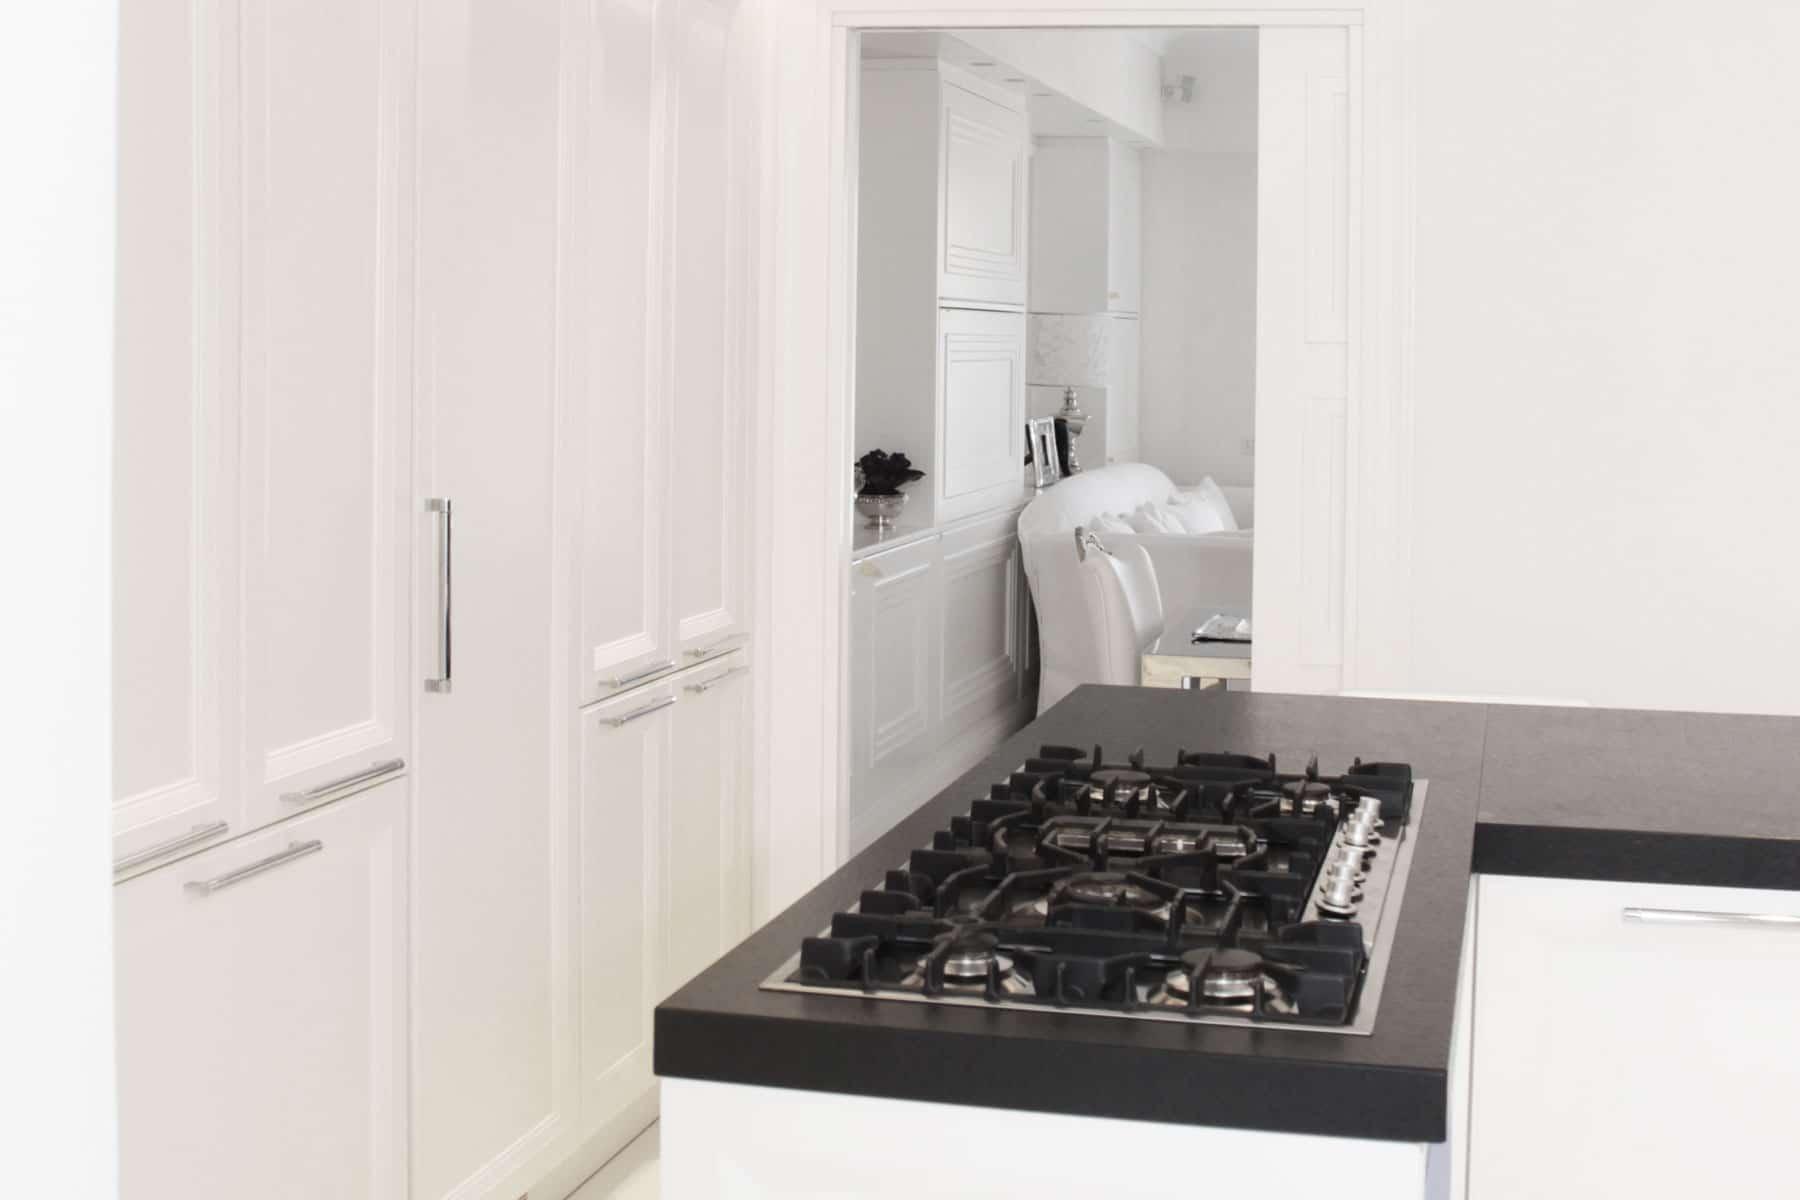 Cucina con piani in ardesia falegnameria caponi - Ardesia in cucina ...